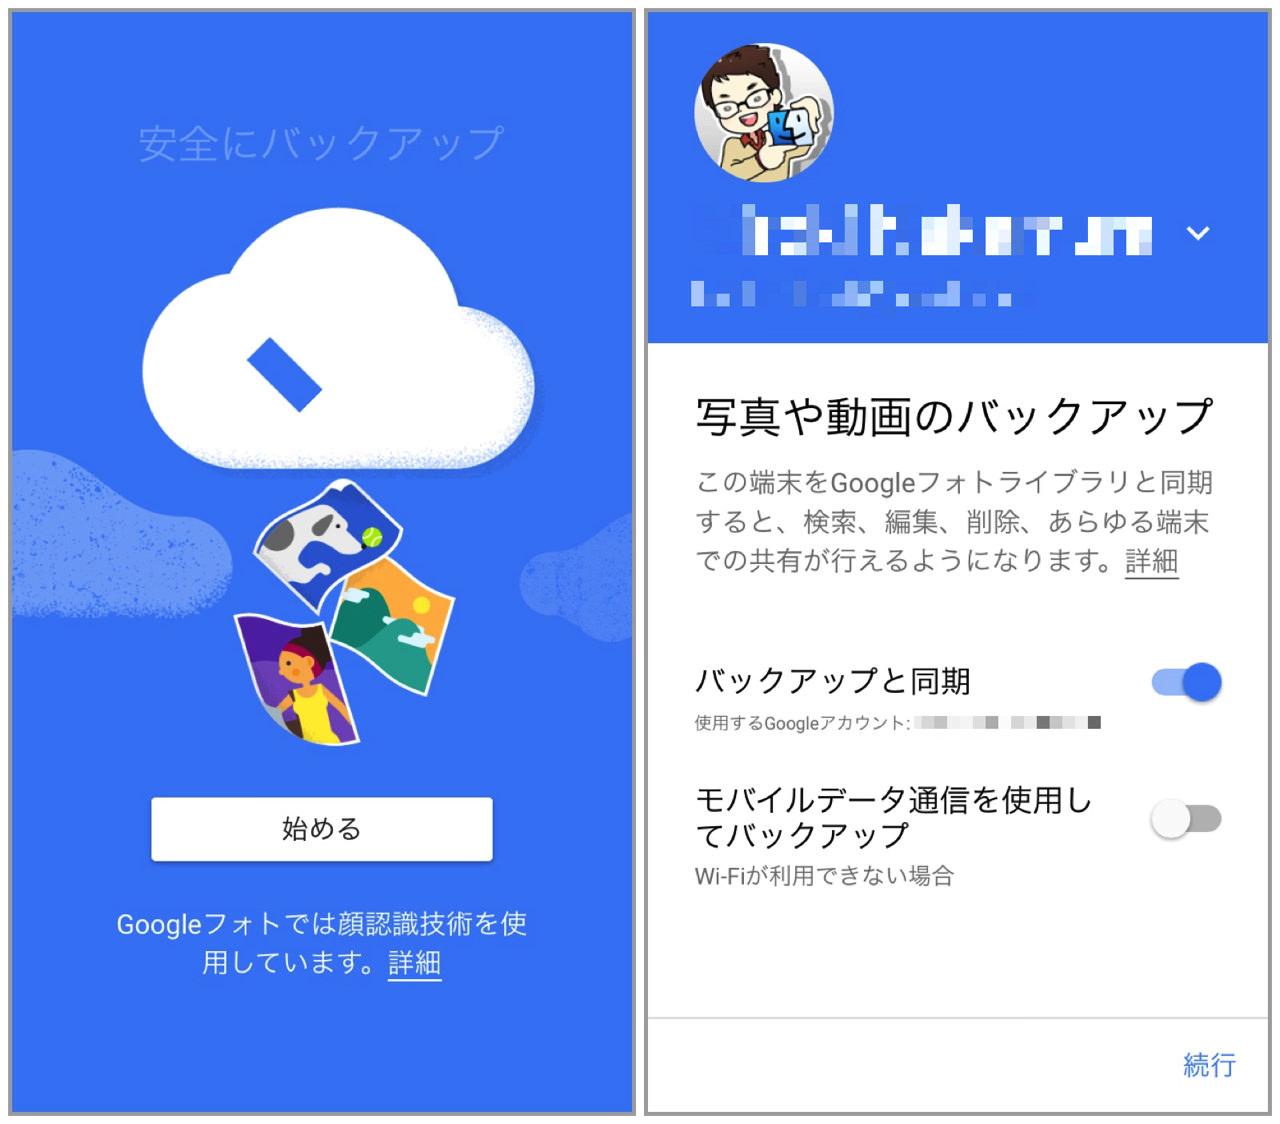 Google photo release6